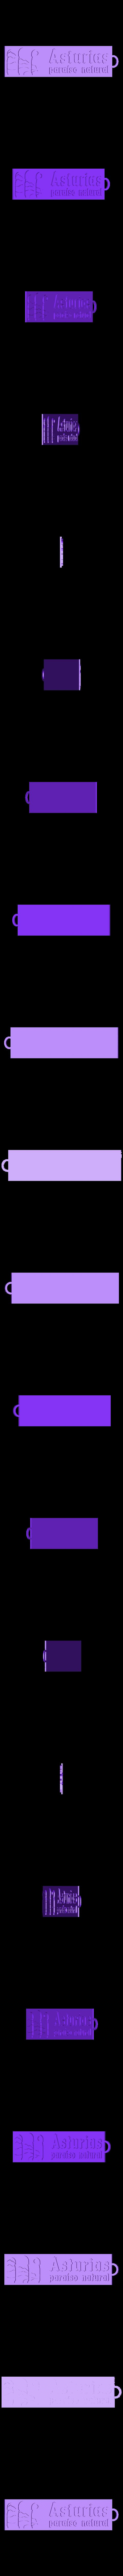 ASTURIAS.stl Download STL file asturias • 3D printer object, RubenMenendezIglesias